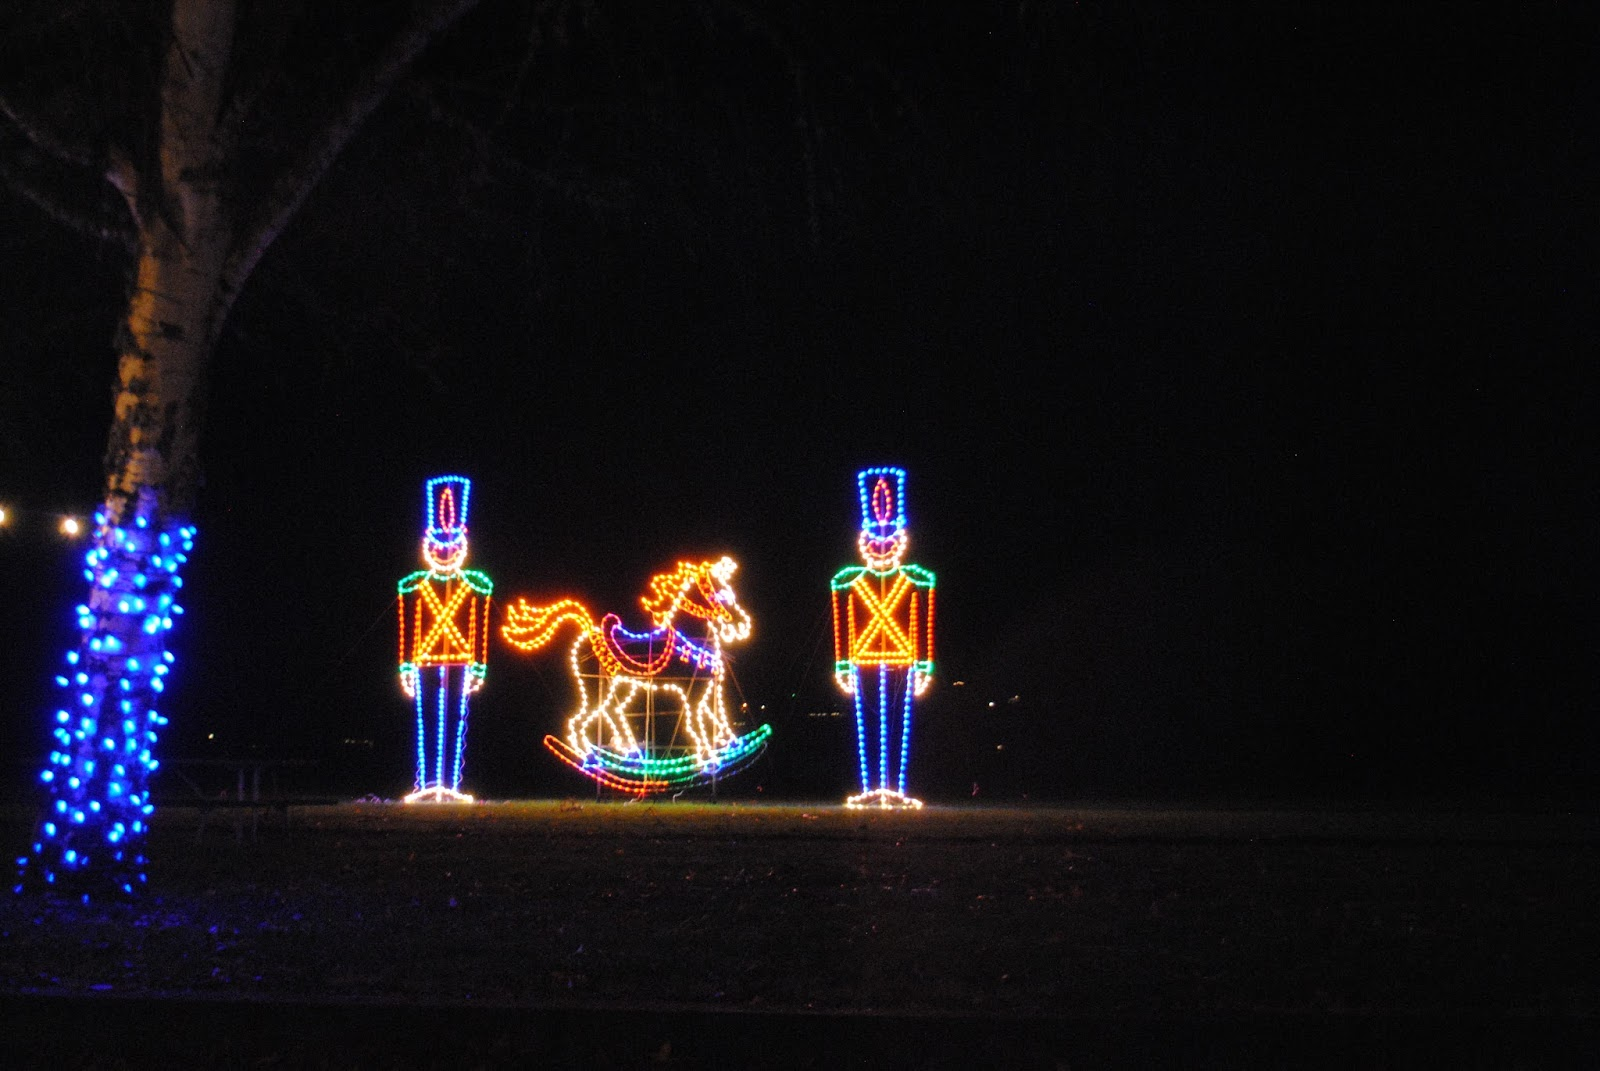 UMPQUA VALLEY FESTIVAL OF LIGHTS - Roseburg - Christmas Lights Trail - What to do in Southern Oregon 3.JPG